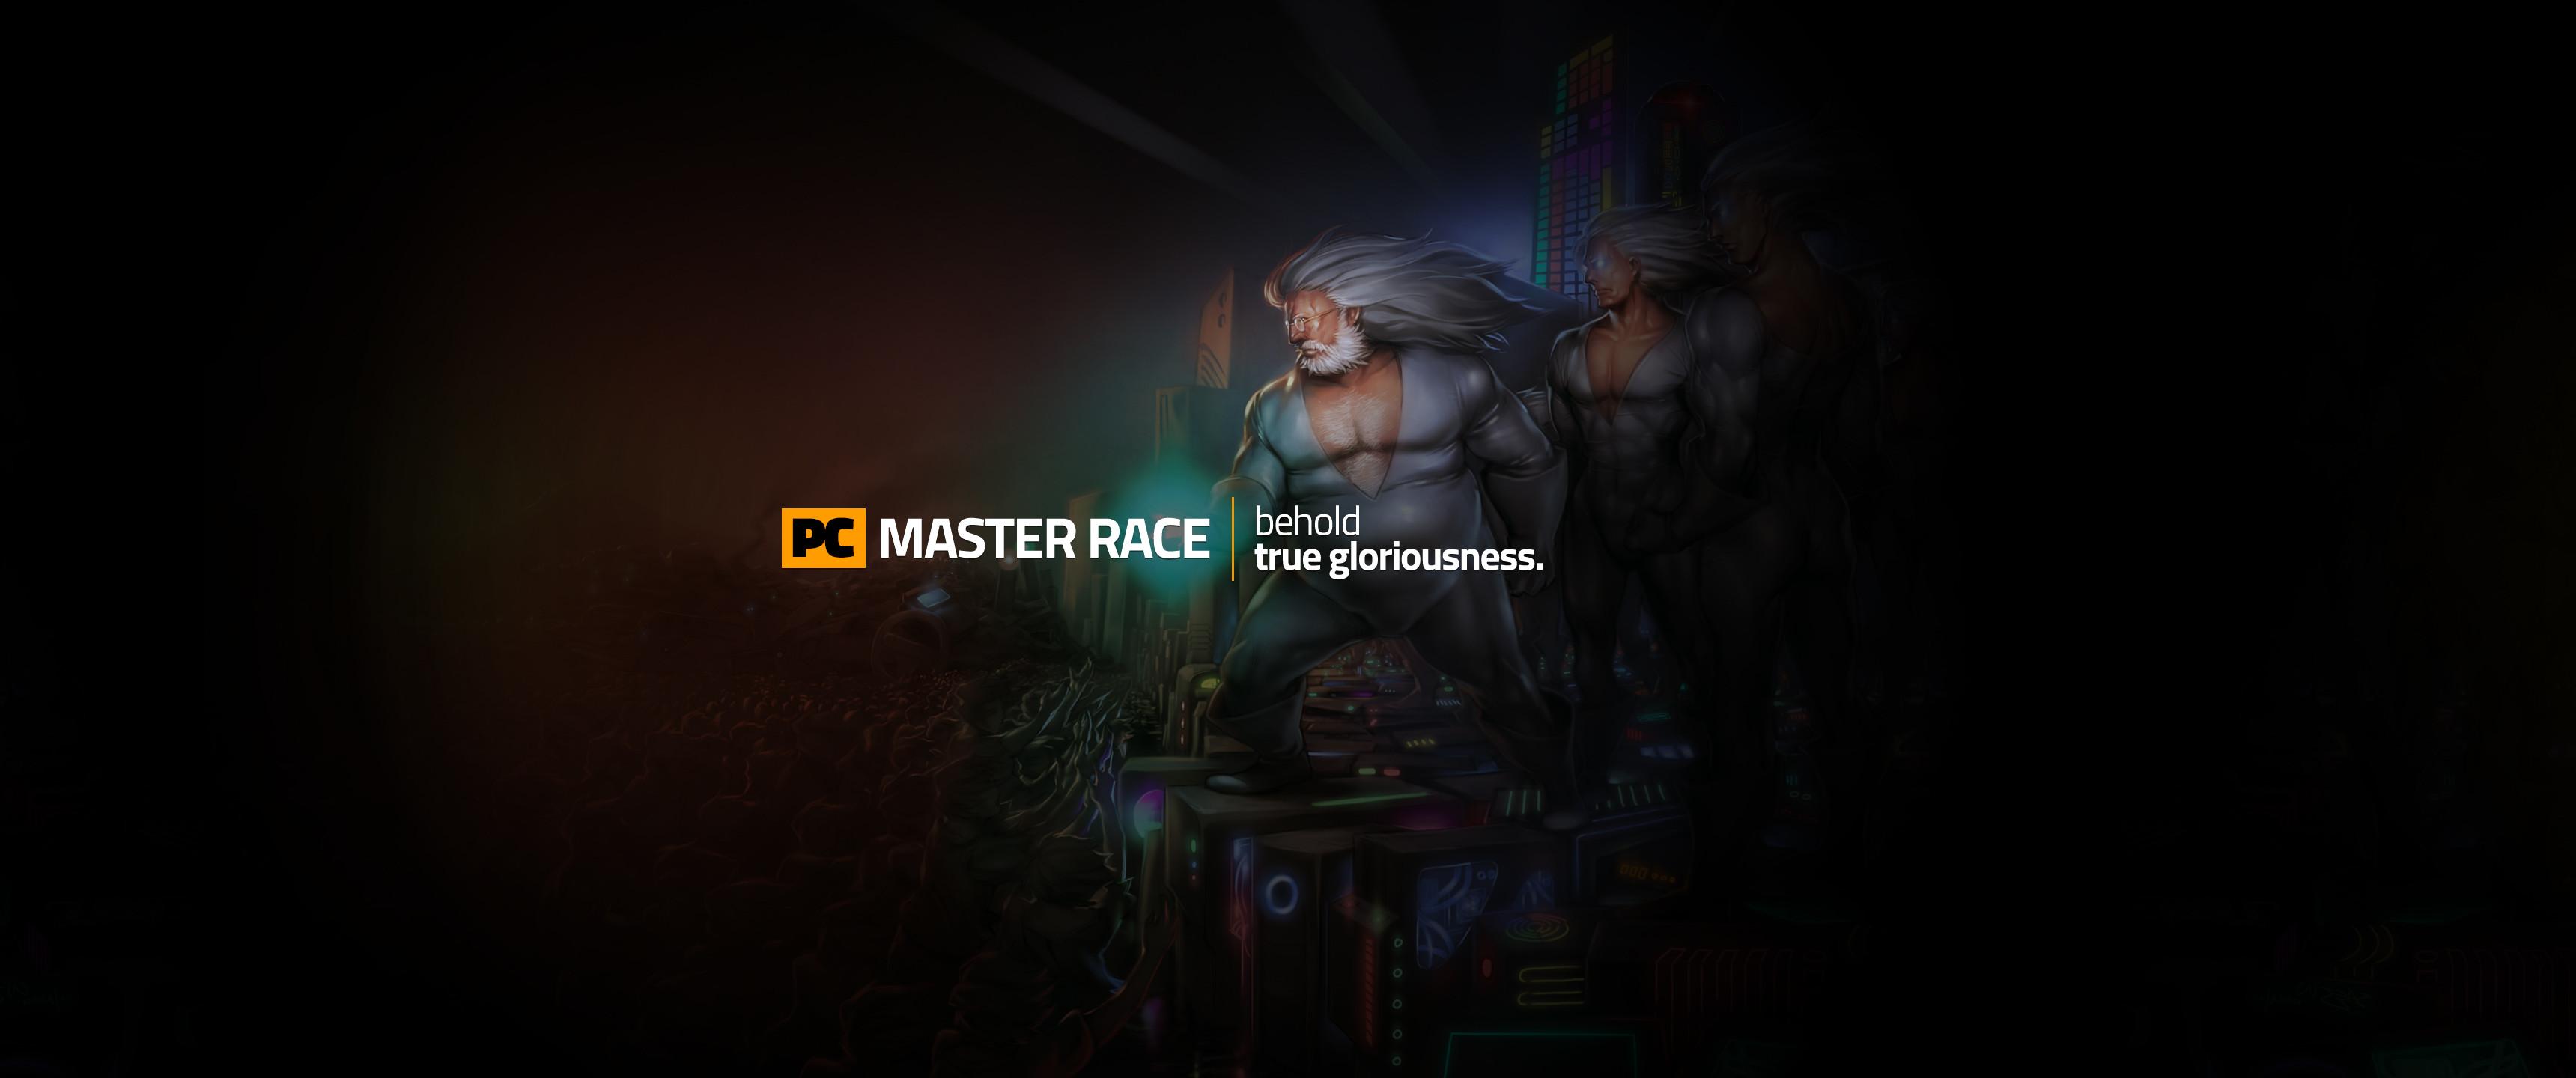 JustMasterRaceThingsPC MasterRace wallpaper [3440×1440] …